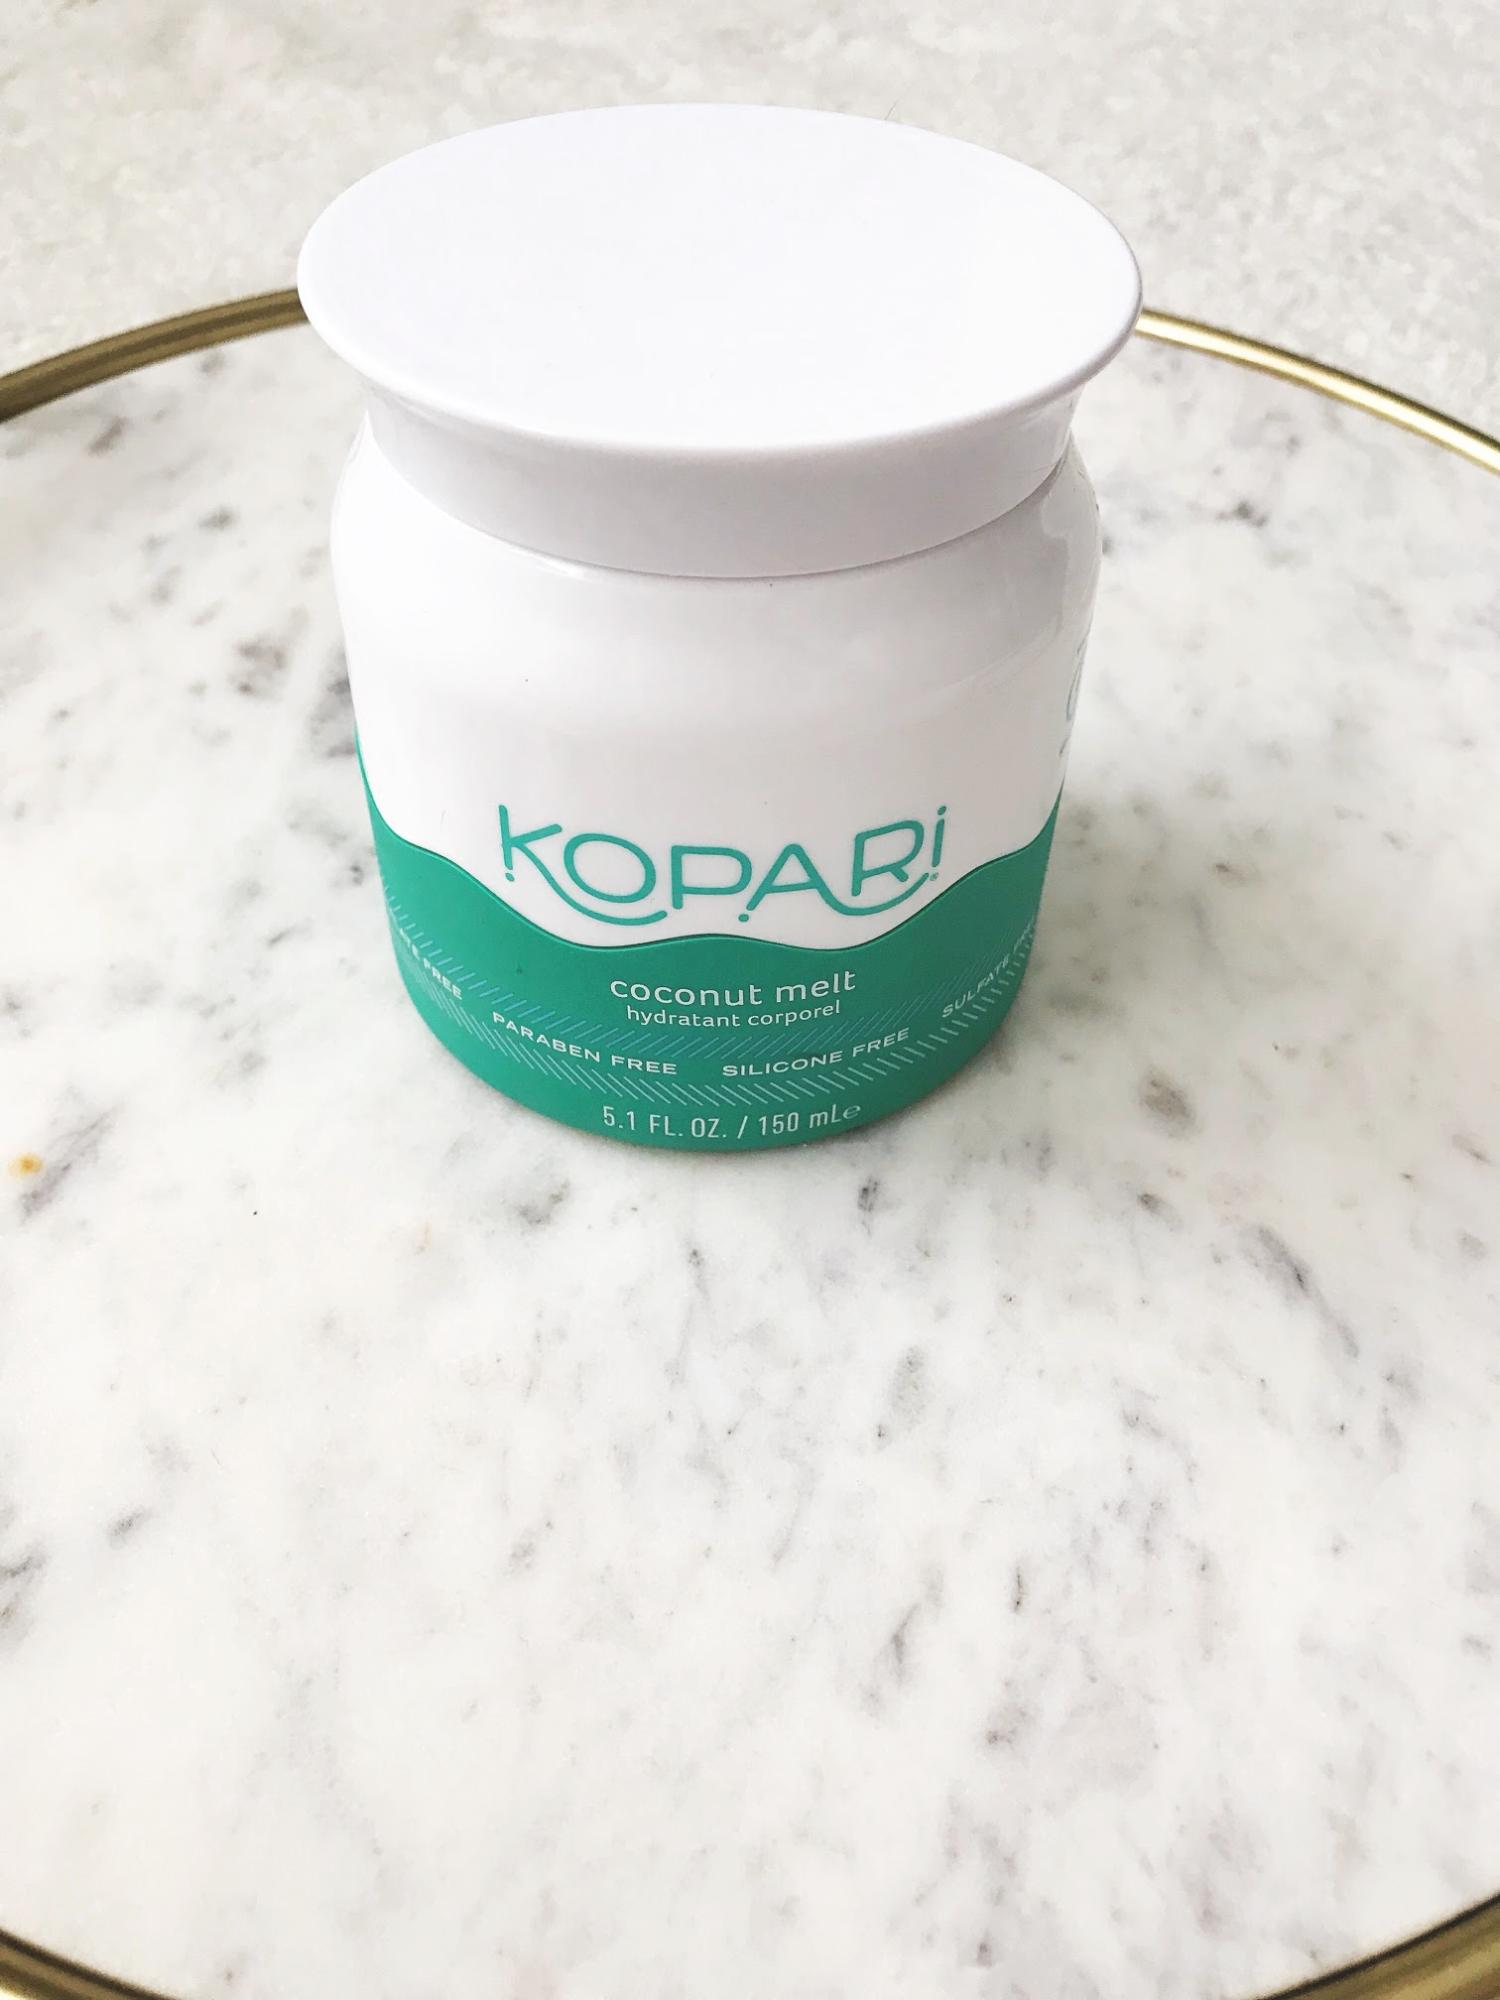 STH 6 Beauty Products I'm Currently Loving-Kopari Coconut Melt